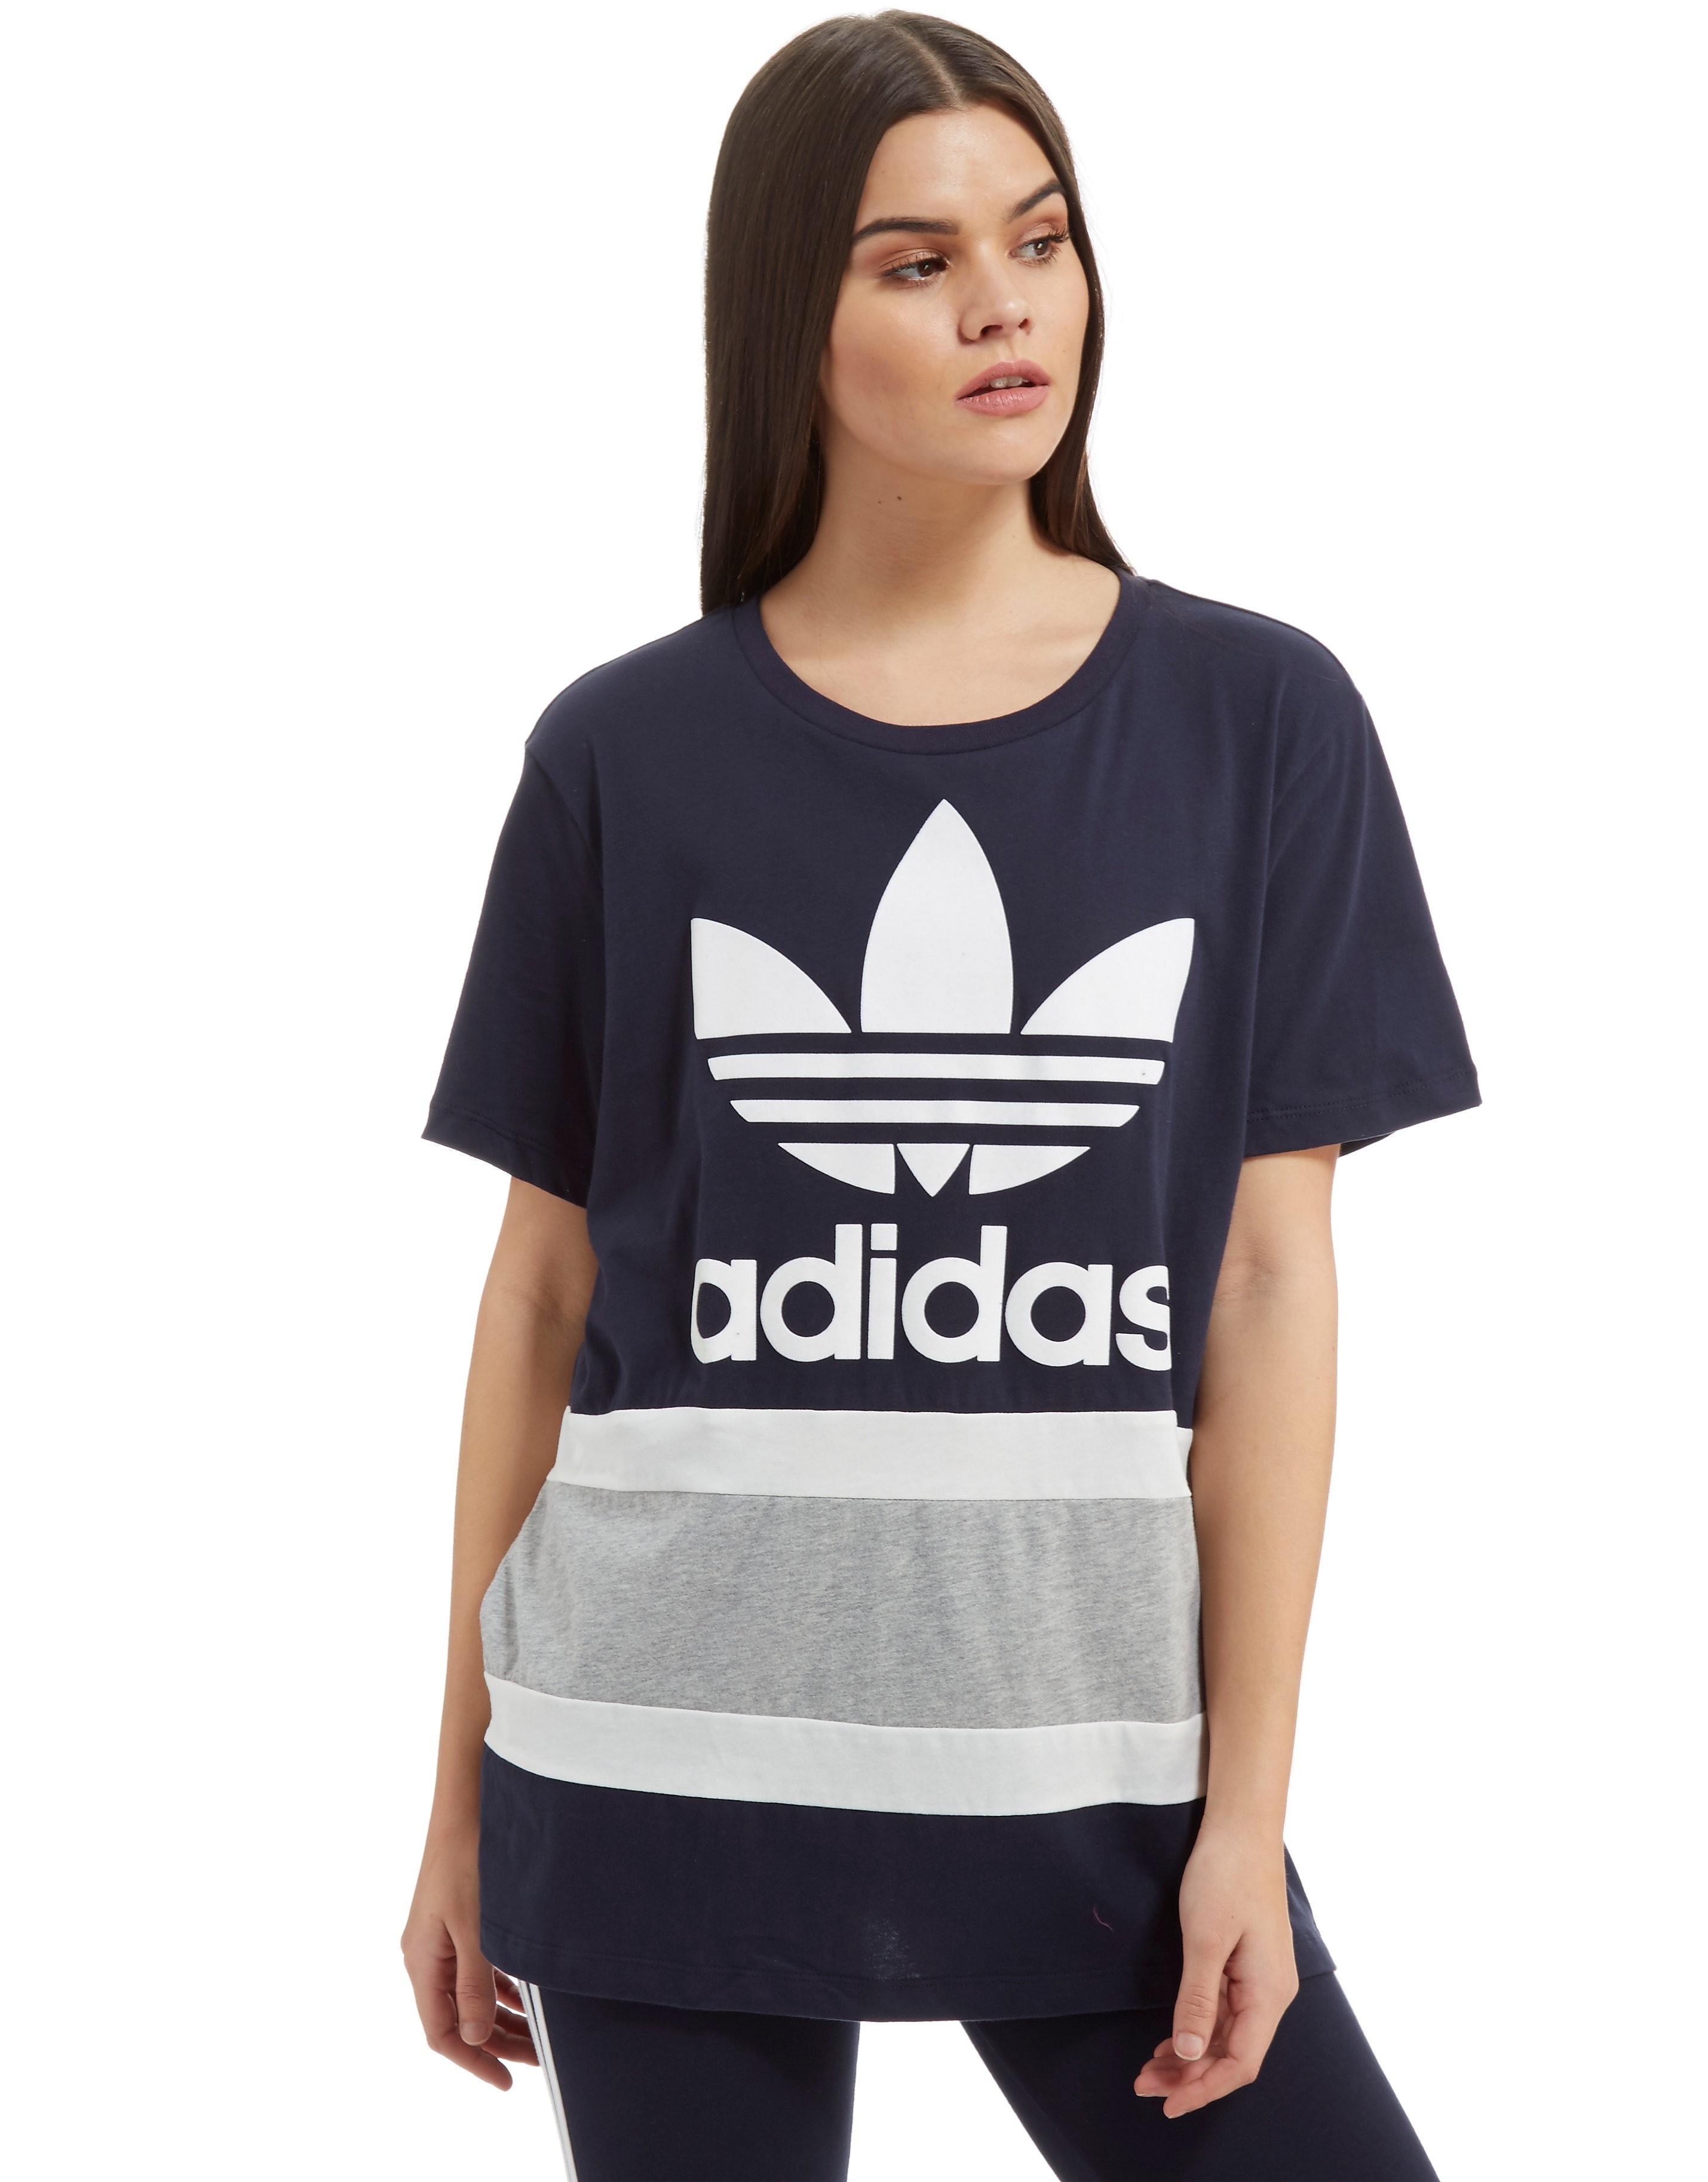 adidas Originals Paneel Trefoil T-Shirt